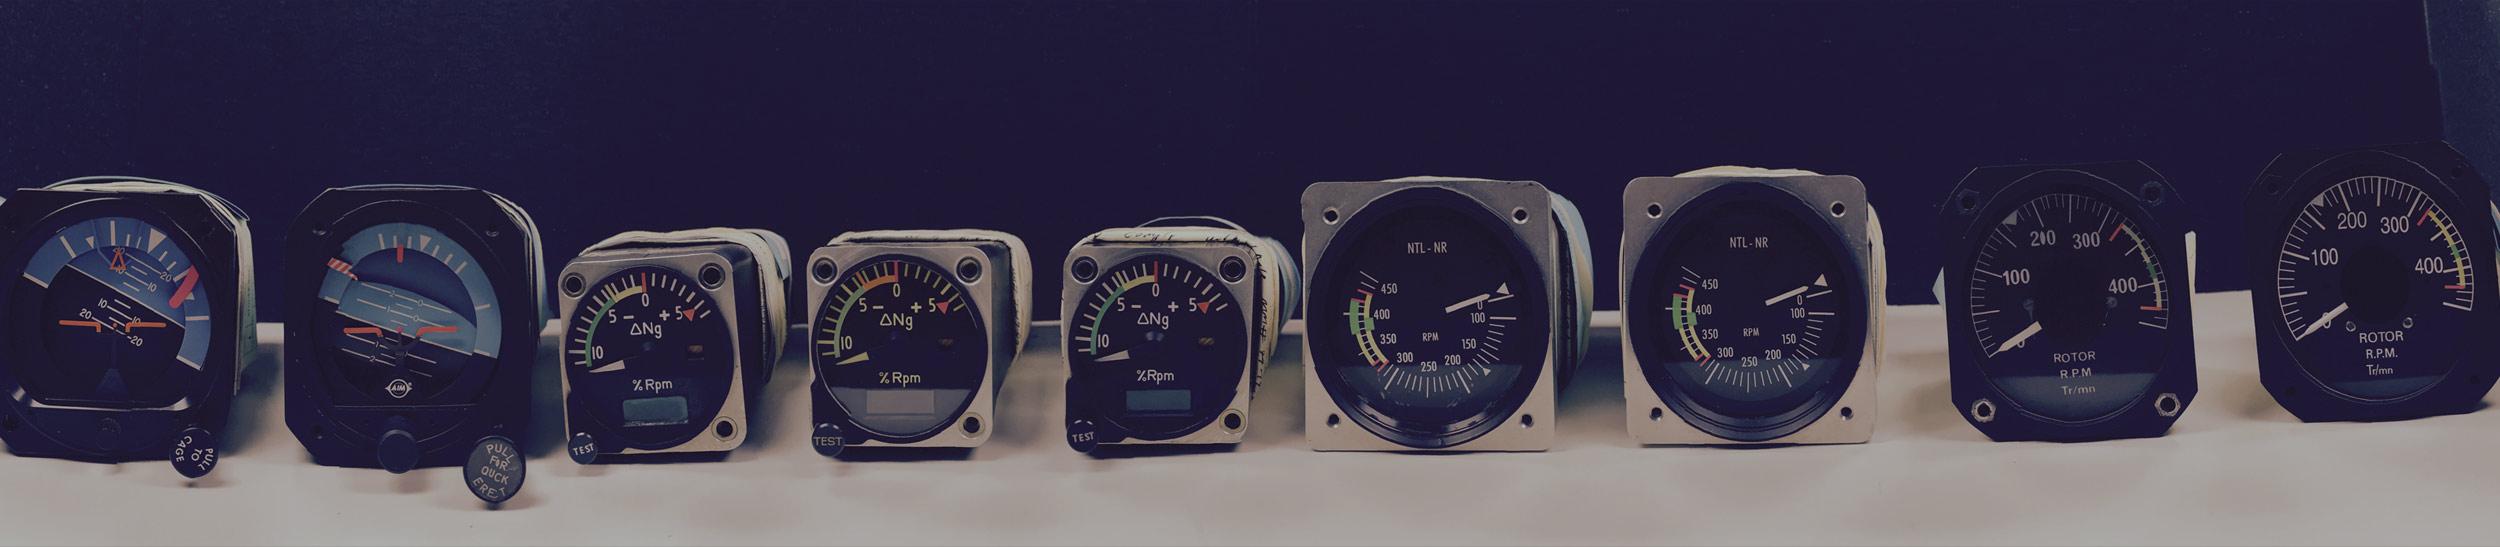 Tri-County Instruments, Inc: Aeronautic Instrument Sales